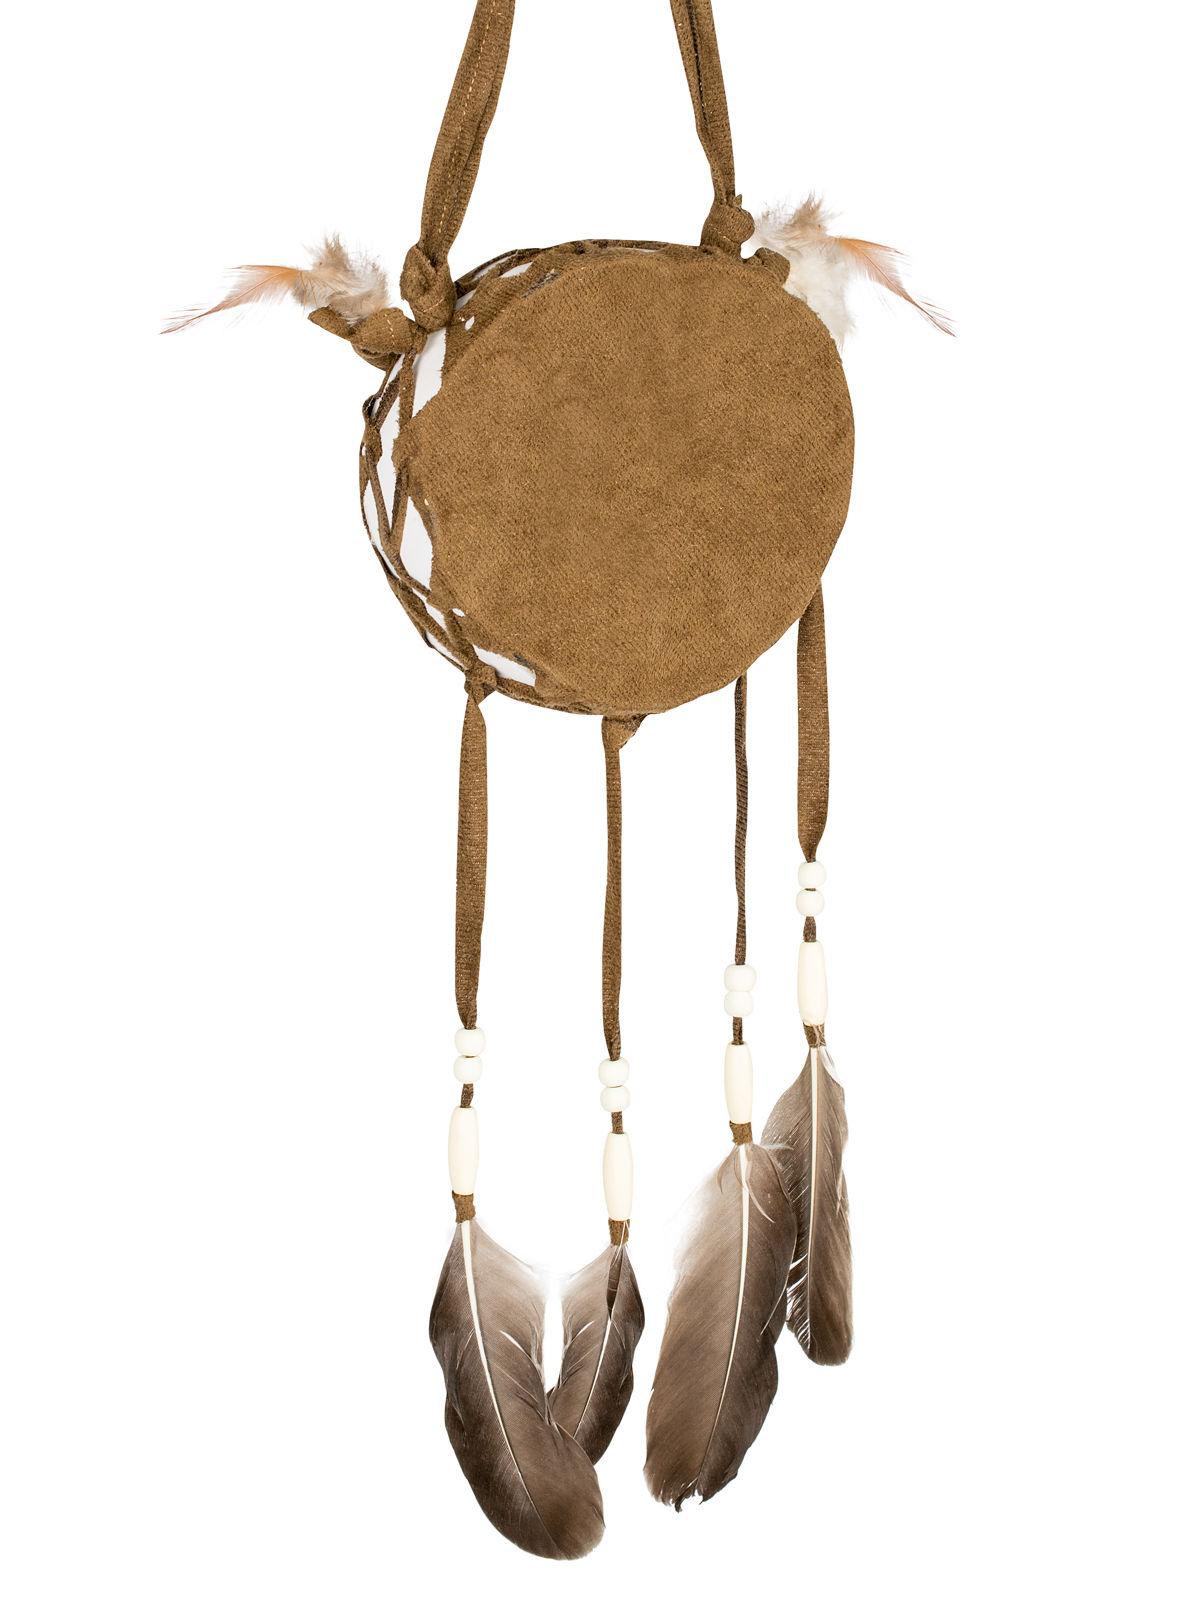 indianer trommel mit federn braun g nstige faschings accessoires zubeh r bei karneval megastore. Black Bedroom Furniture Sets. Home Design Ideas